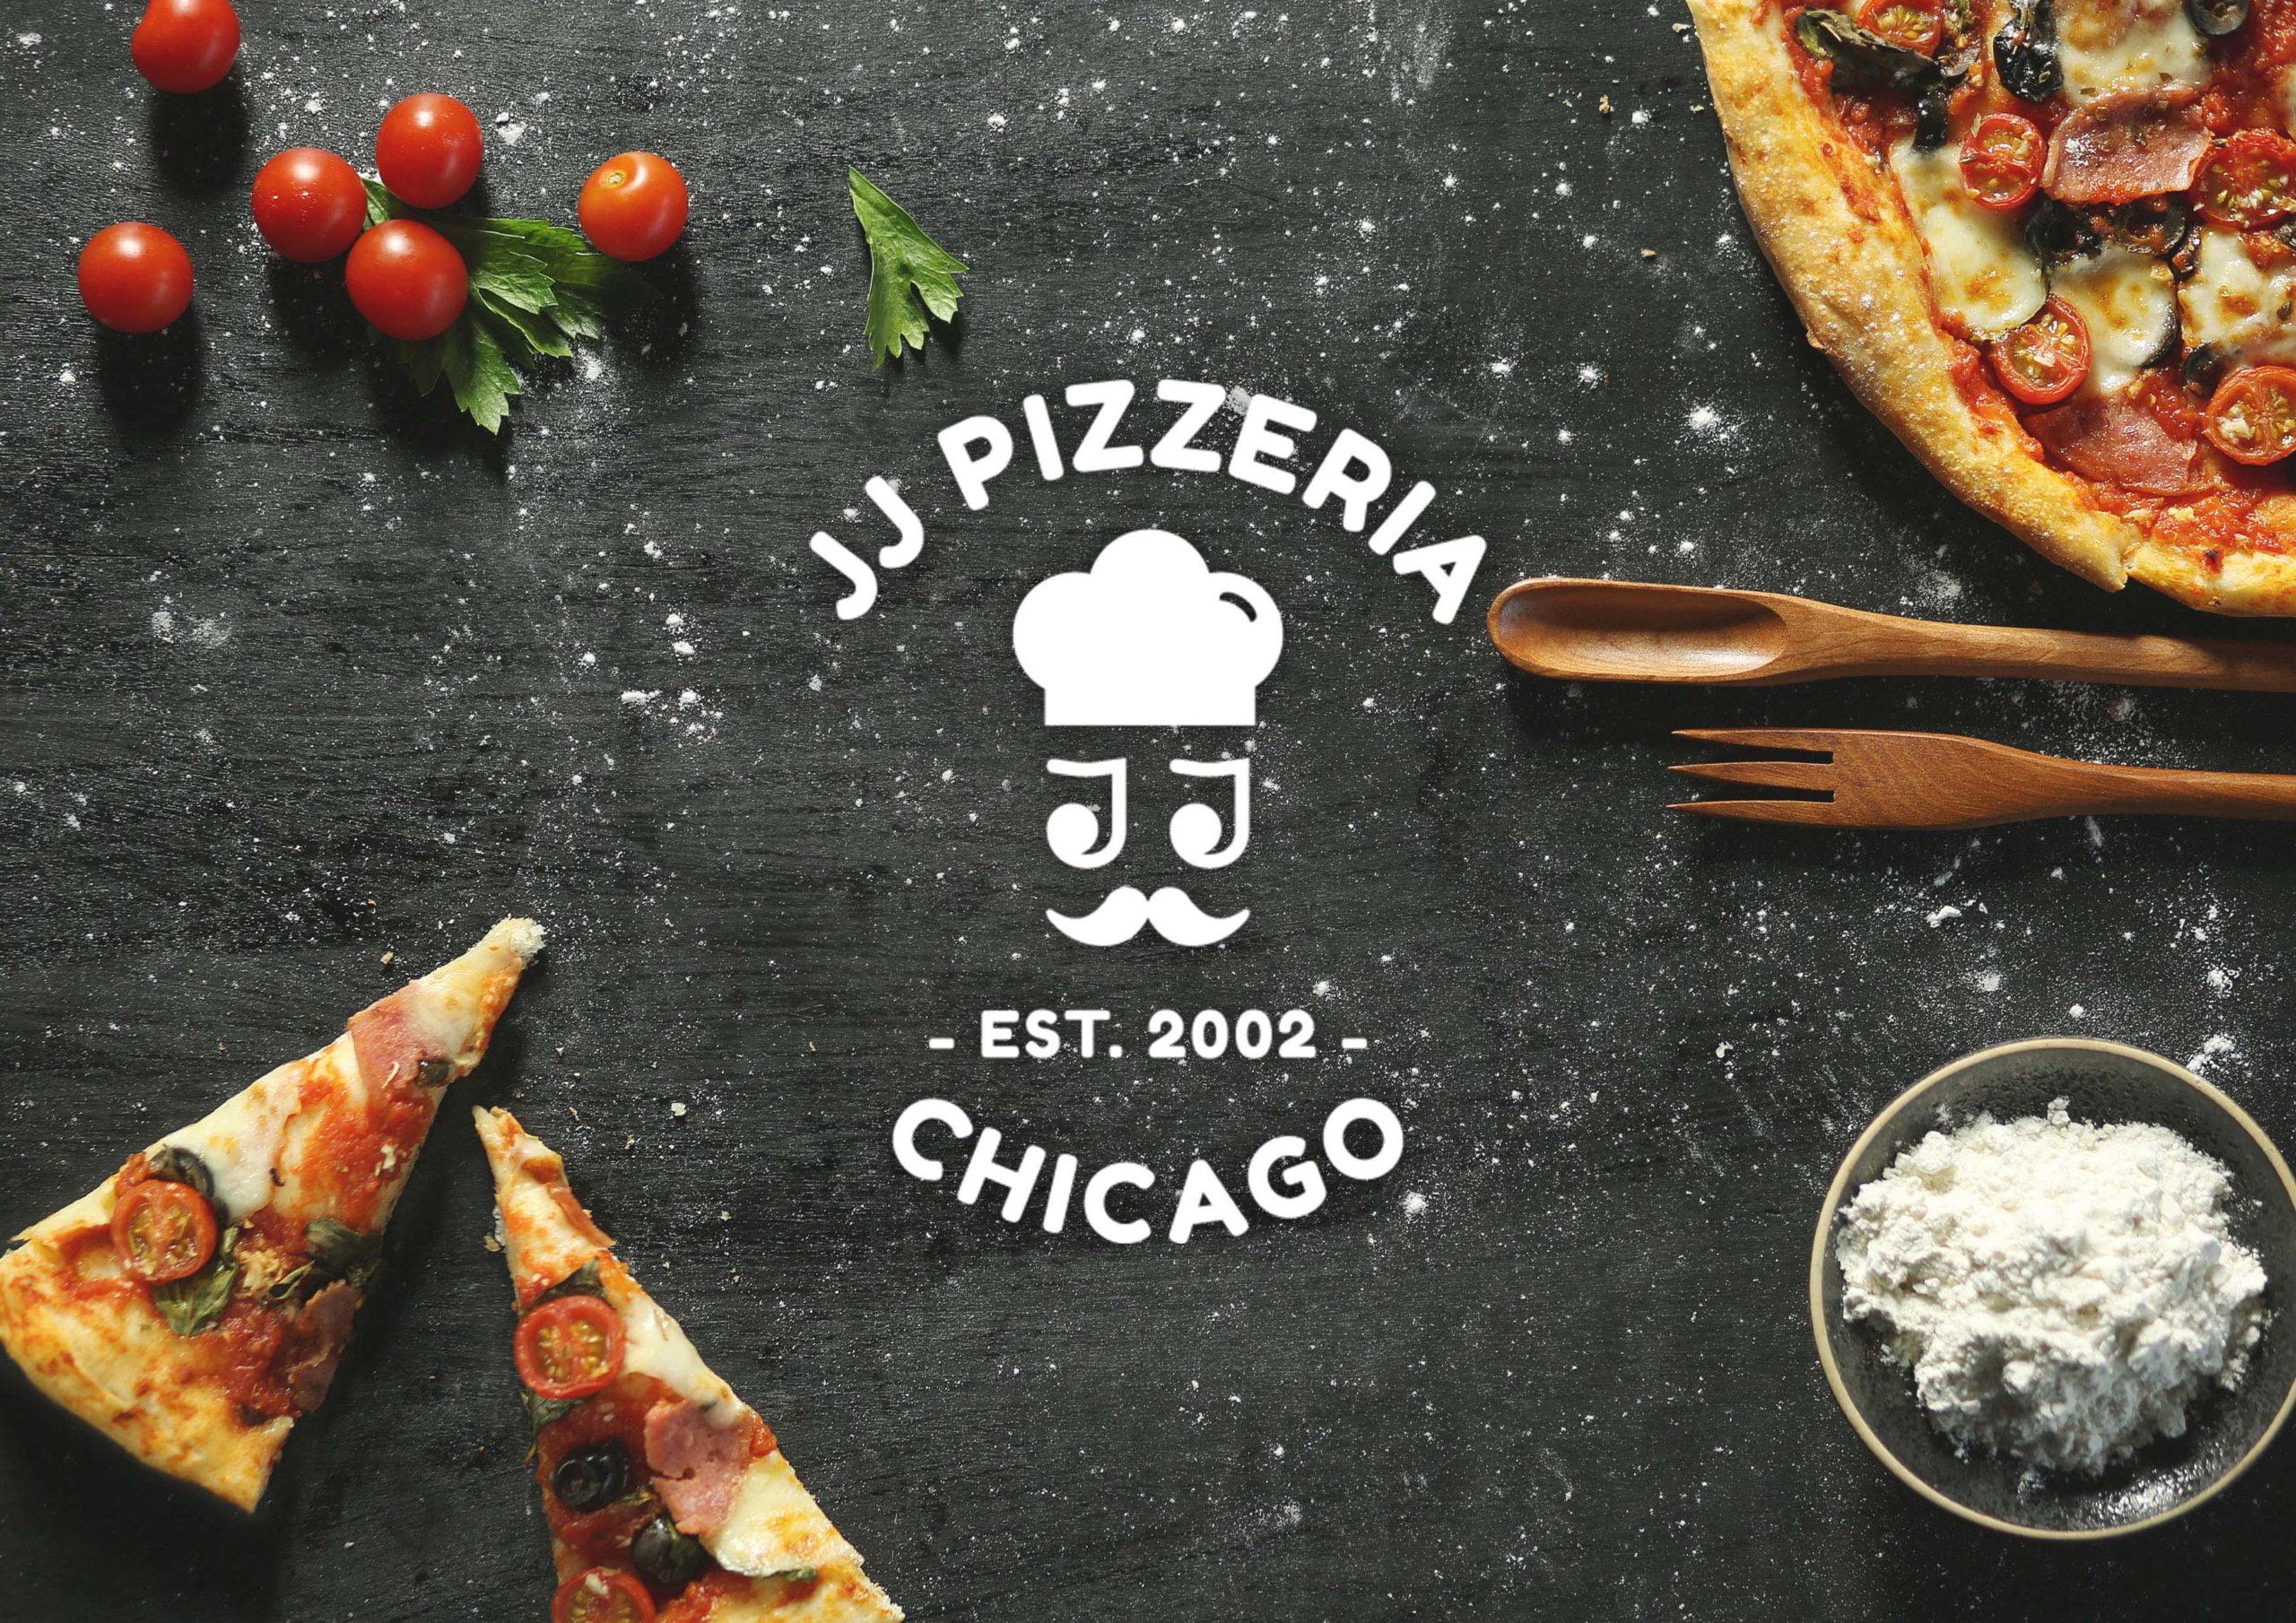 JJ-Pizzeria-Logo-Pizza